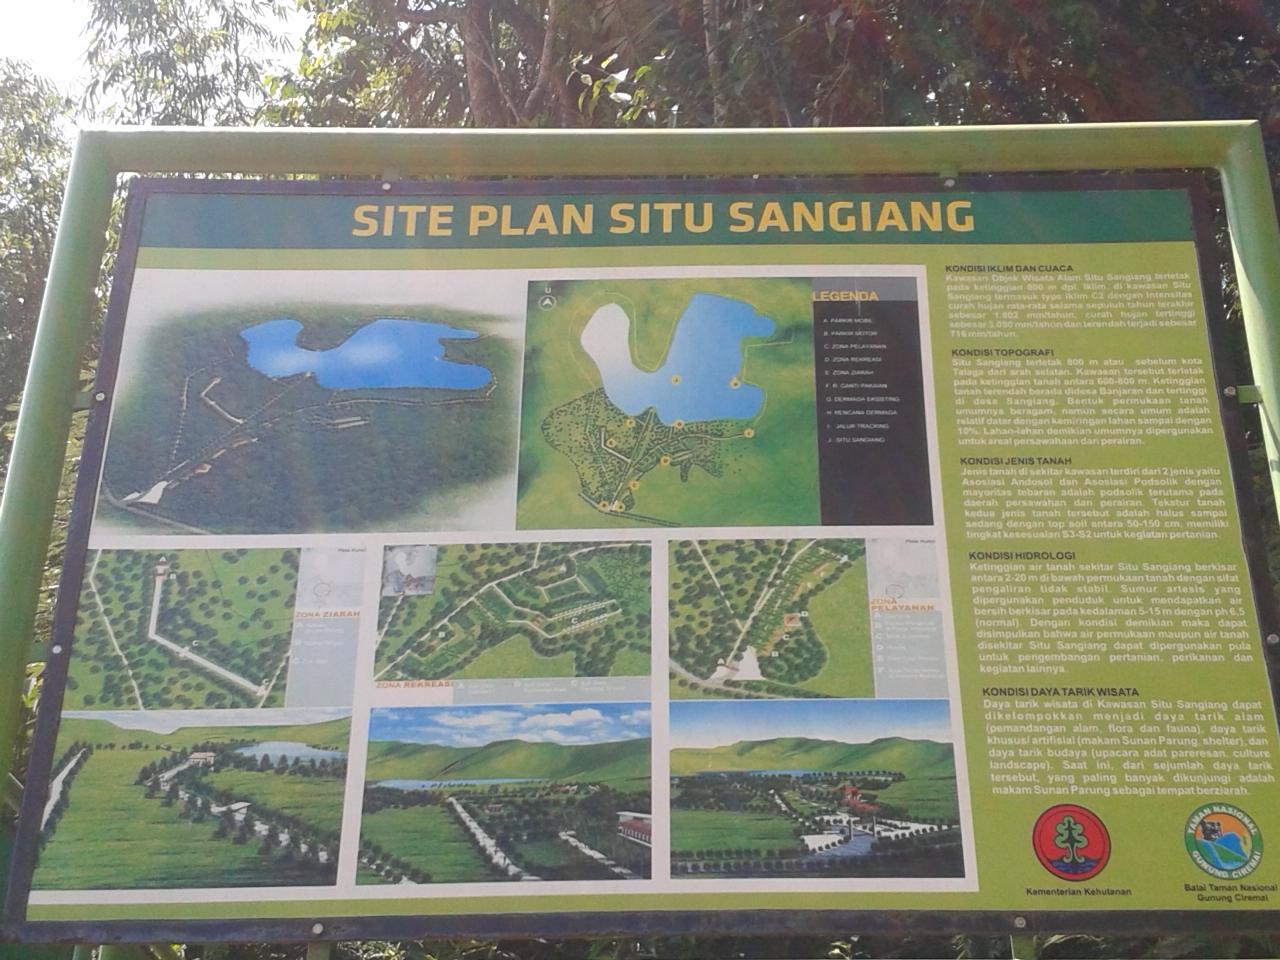 Download this Site Plan Kawasan Situ... picture